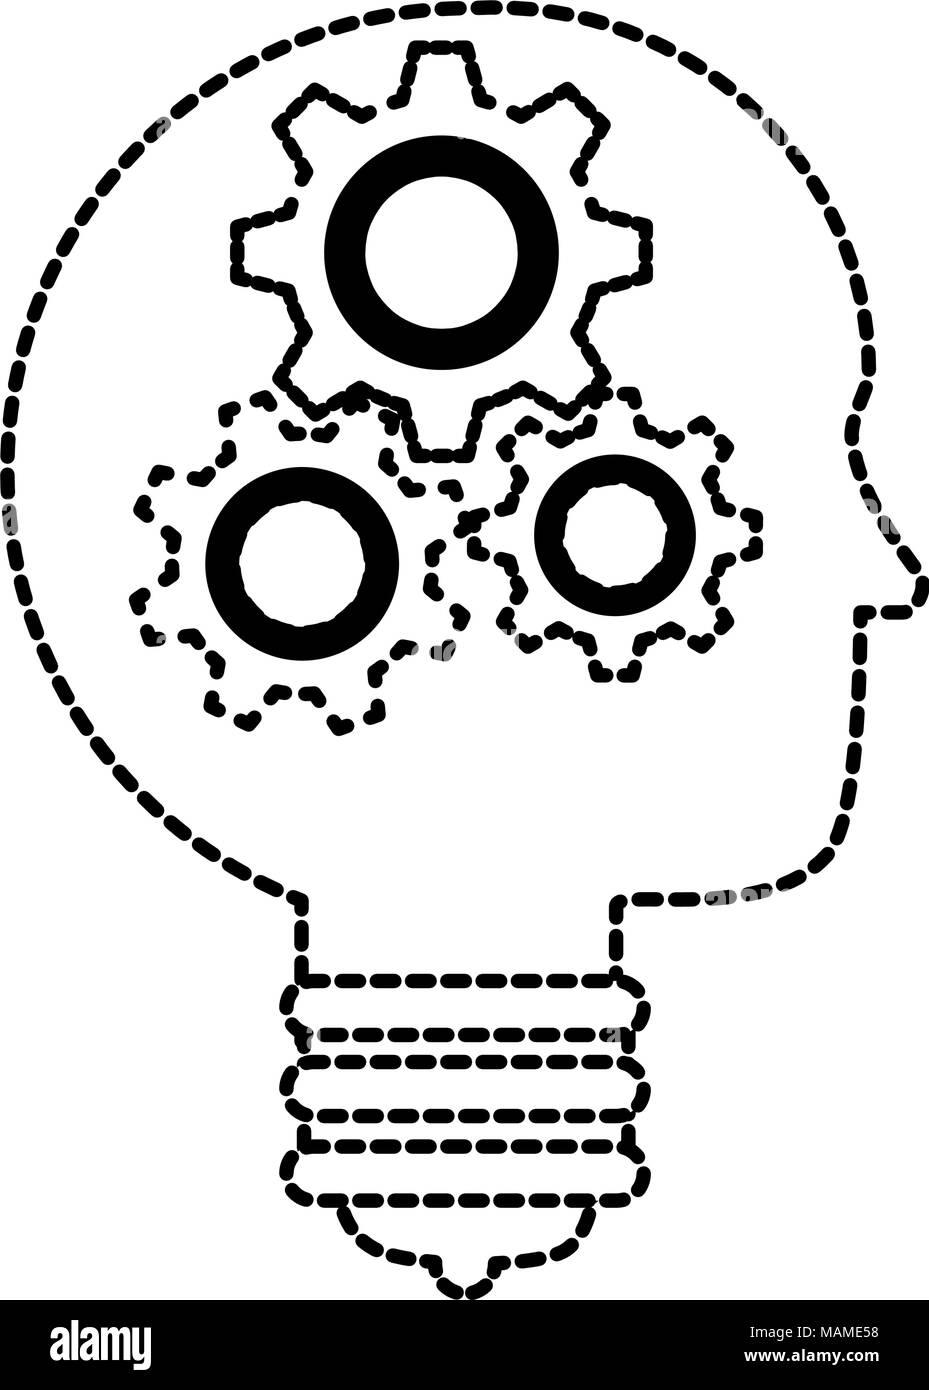 Idée De Photo De Profil glühbirne idee mit profil und zahnräder vektor abbildung